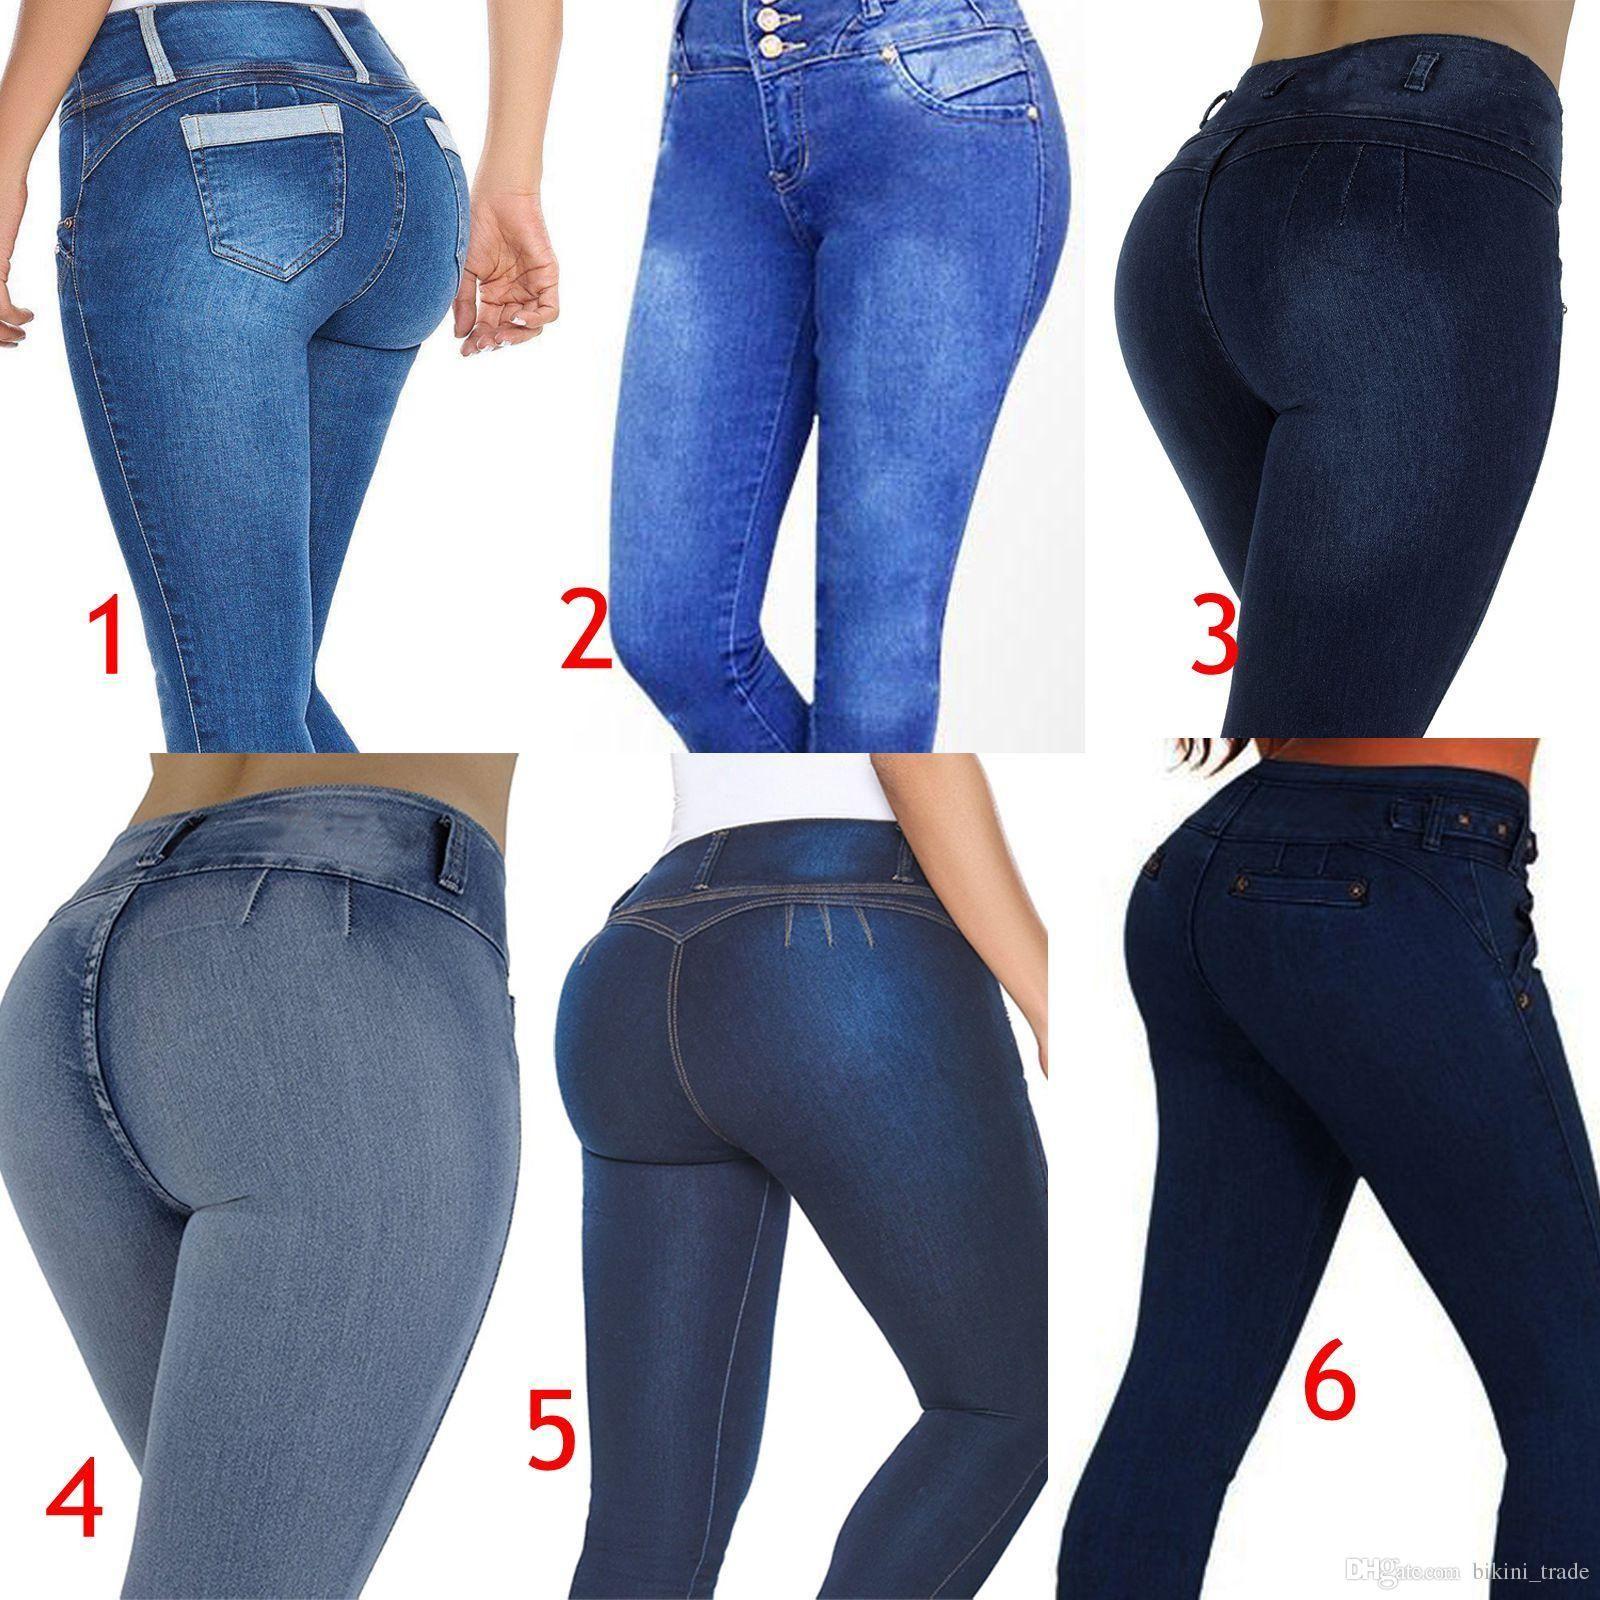 2ebc3851c44 2018 Women s Stretch Denim Pants Skinny Slim Jeans Butt Lifting Pencil Pants  High Waist Jeans Trousers Plus size 2XL